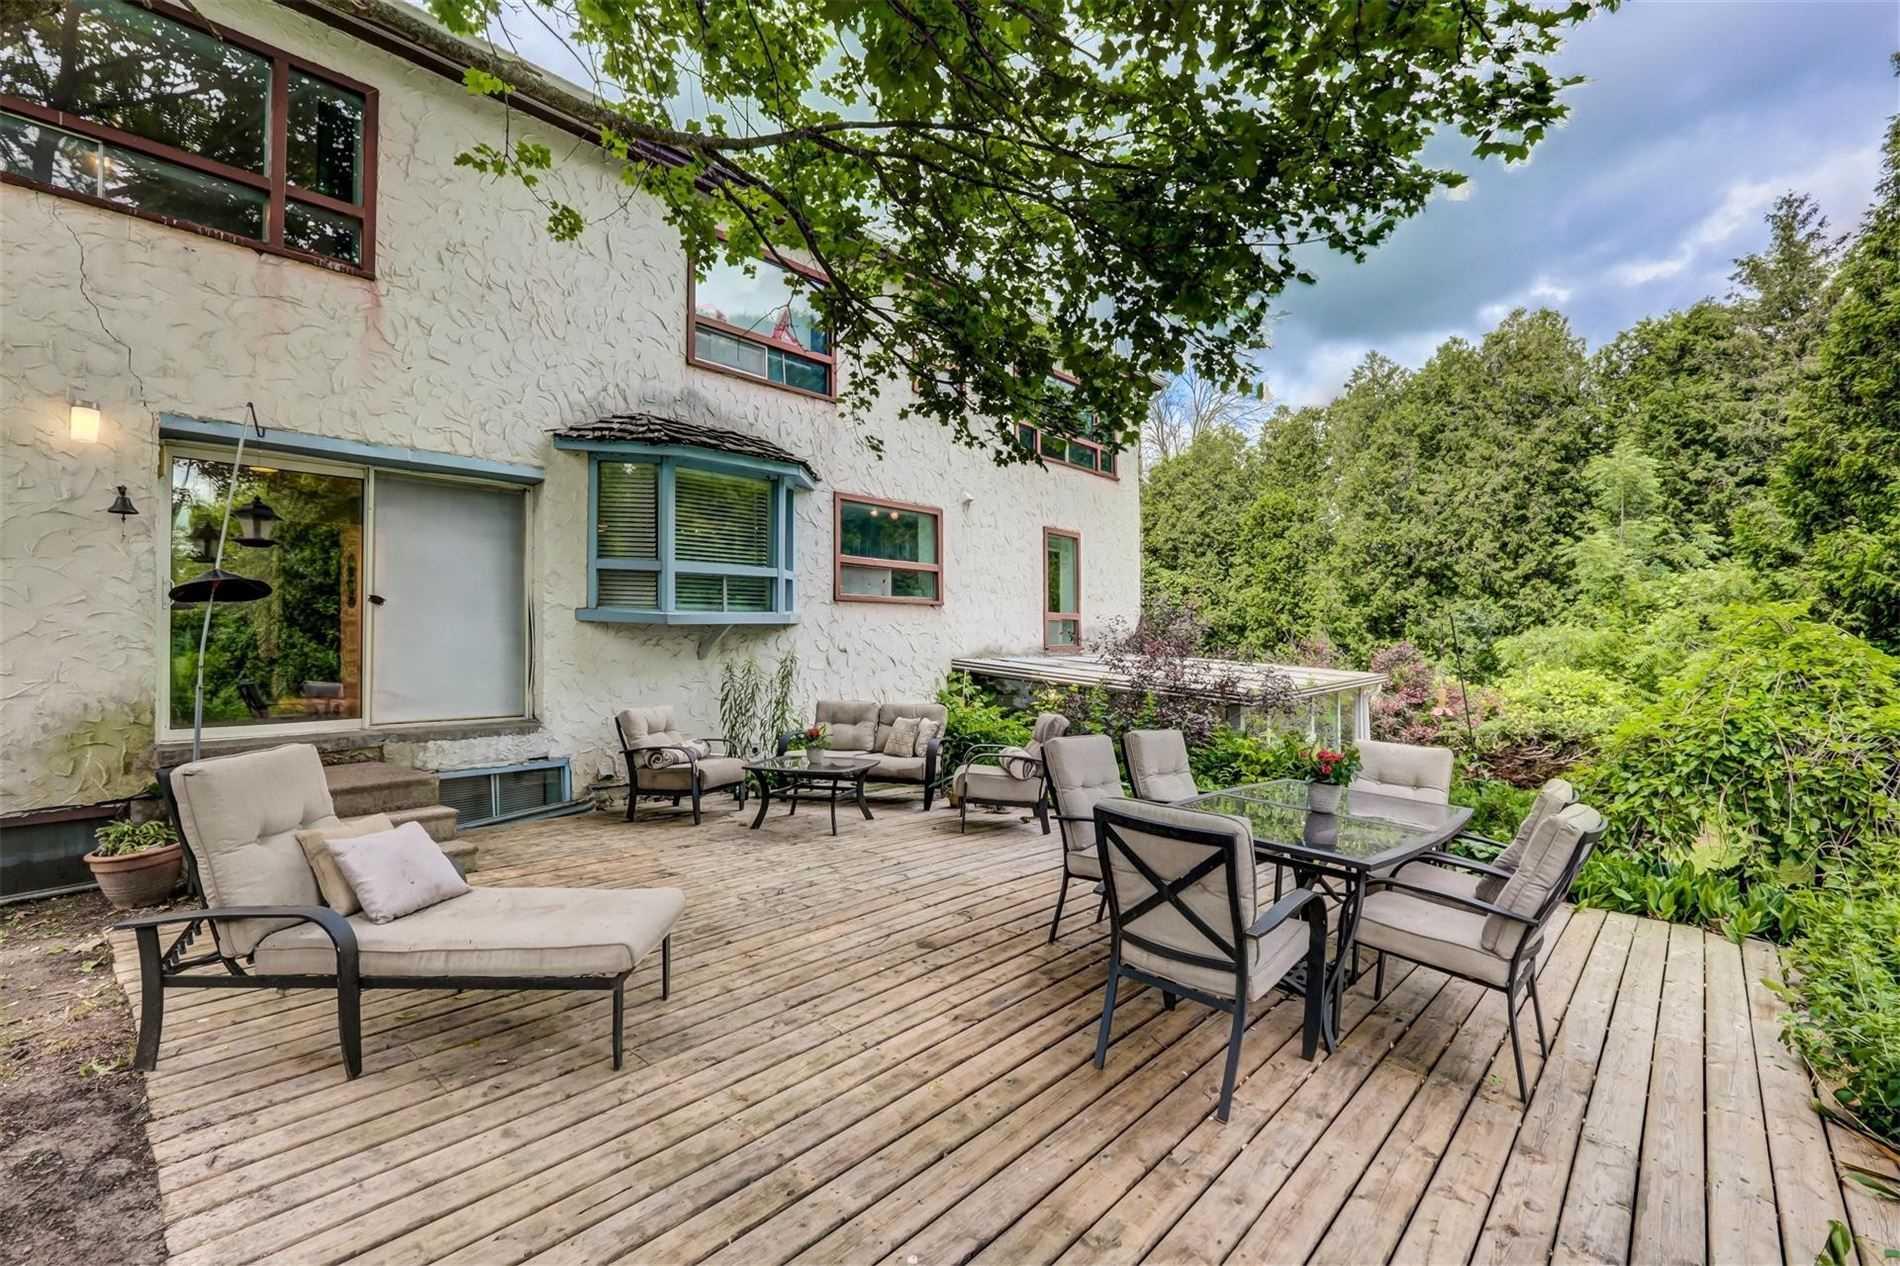 2673 Mount Albert Rd, East Gwillimbury, Ontario (ID N5300891)